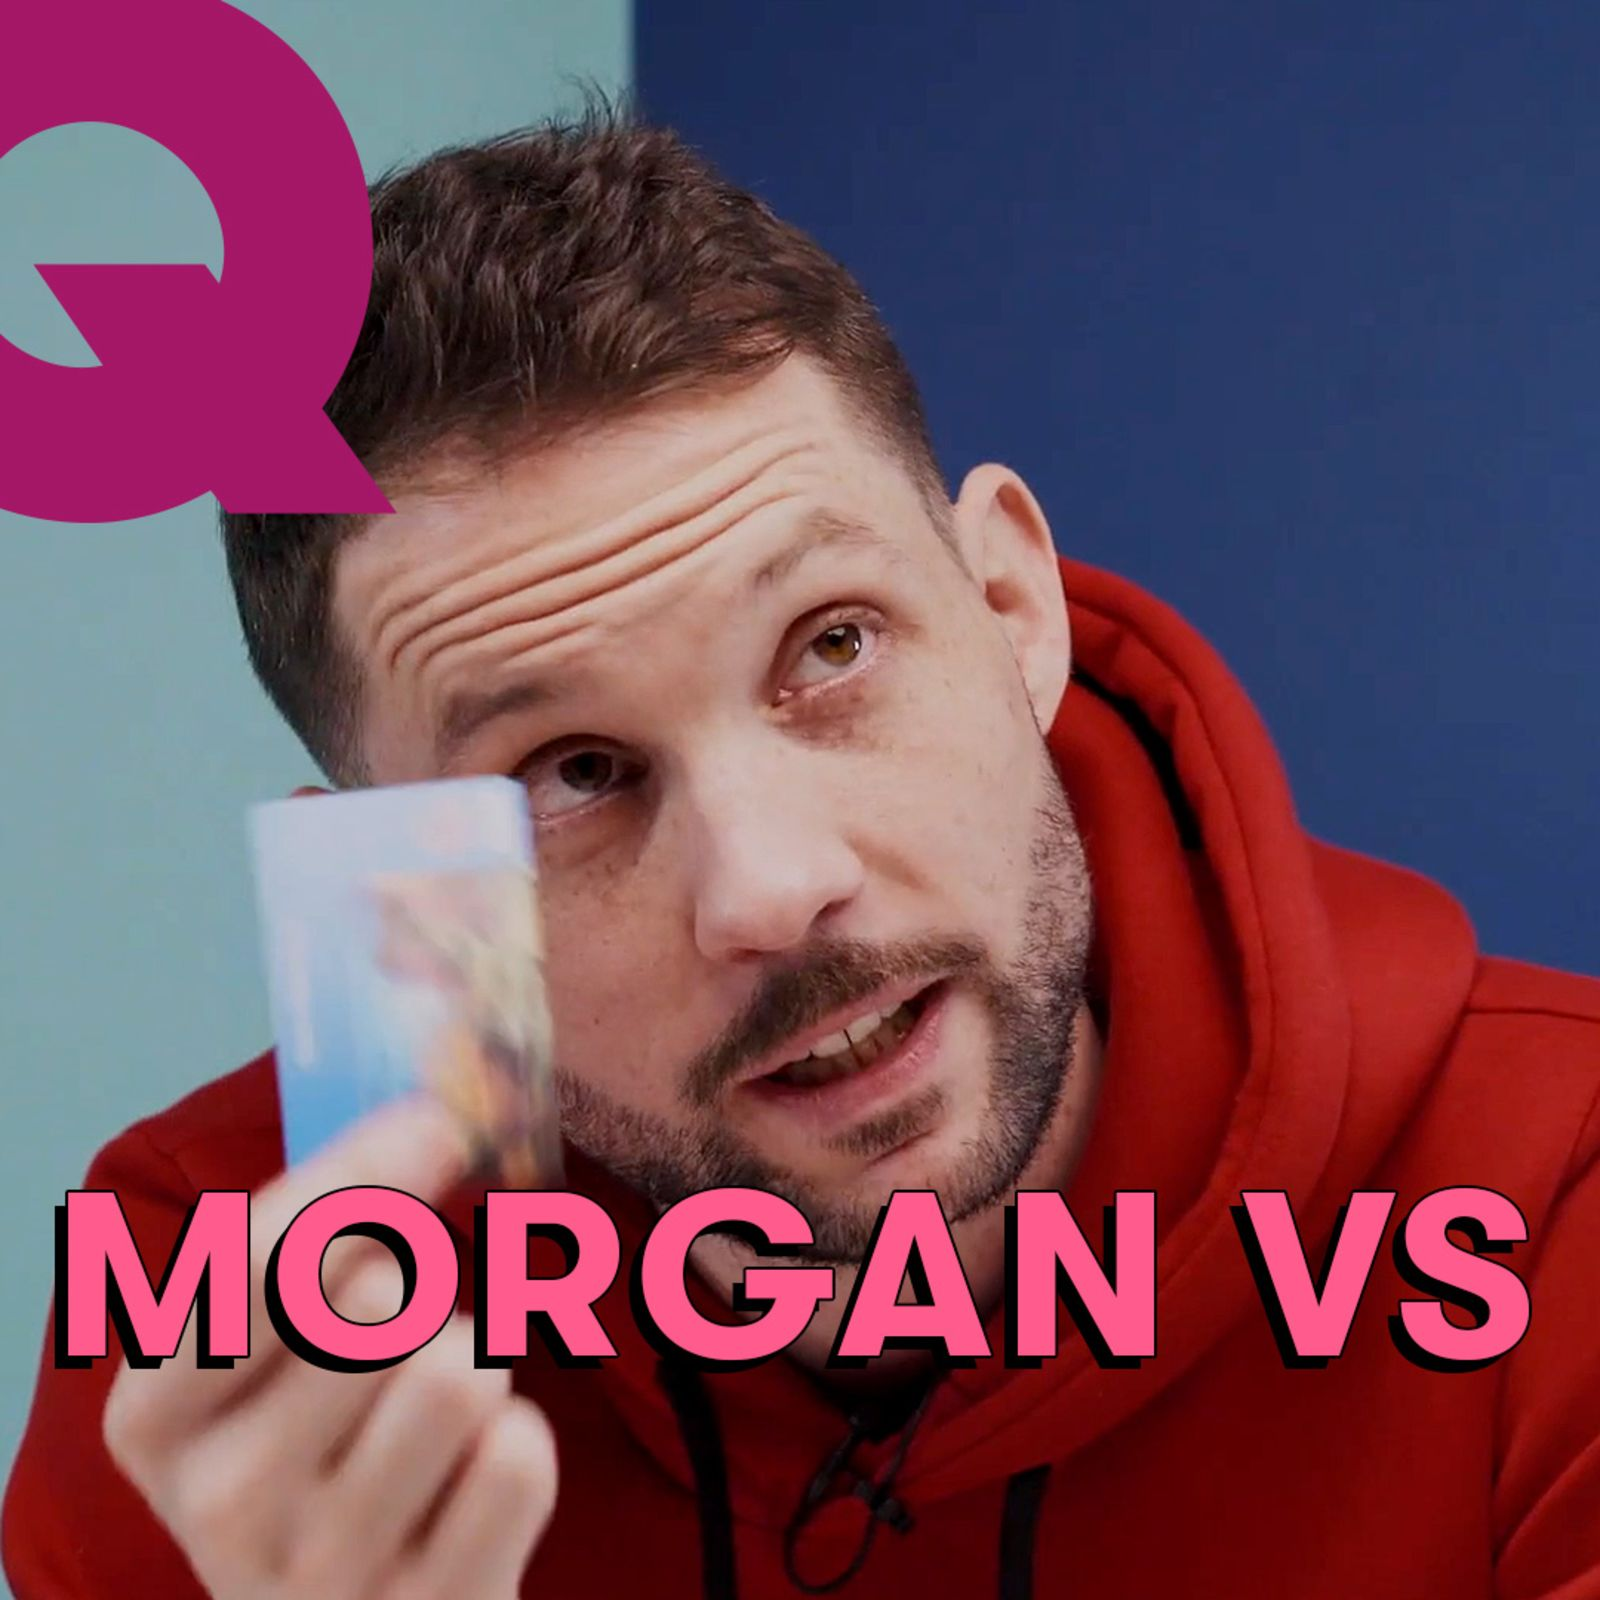 Les 10 Essentiels de Morgan VS (peau de serpent, boules Quies et grains de café)